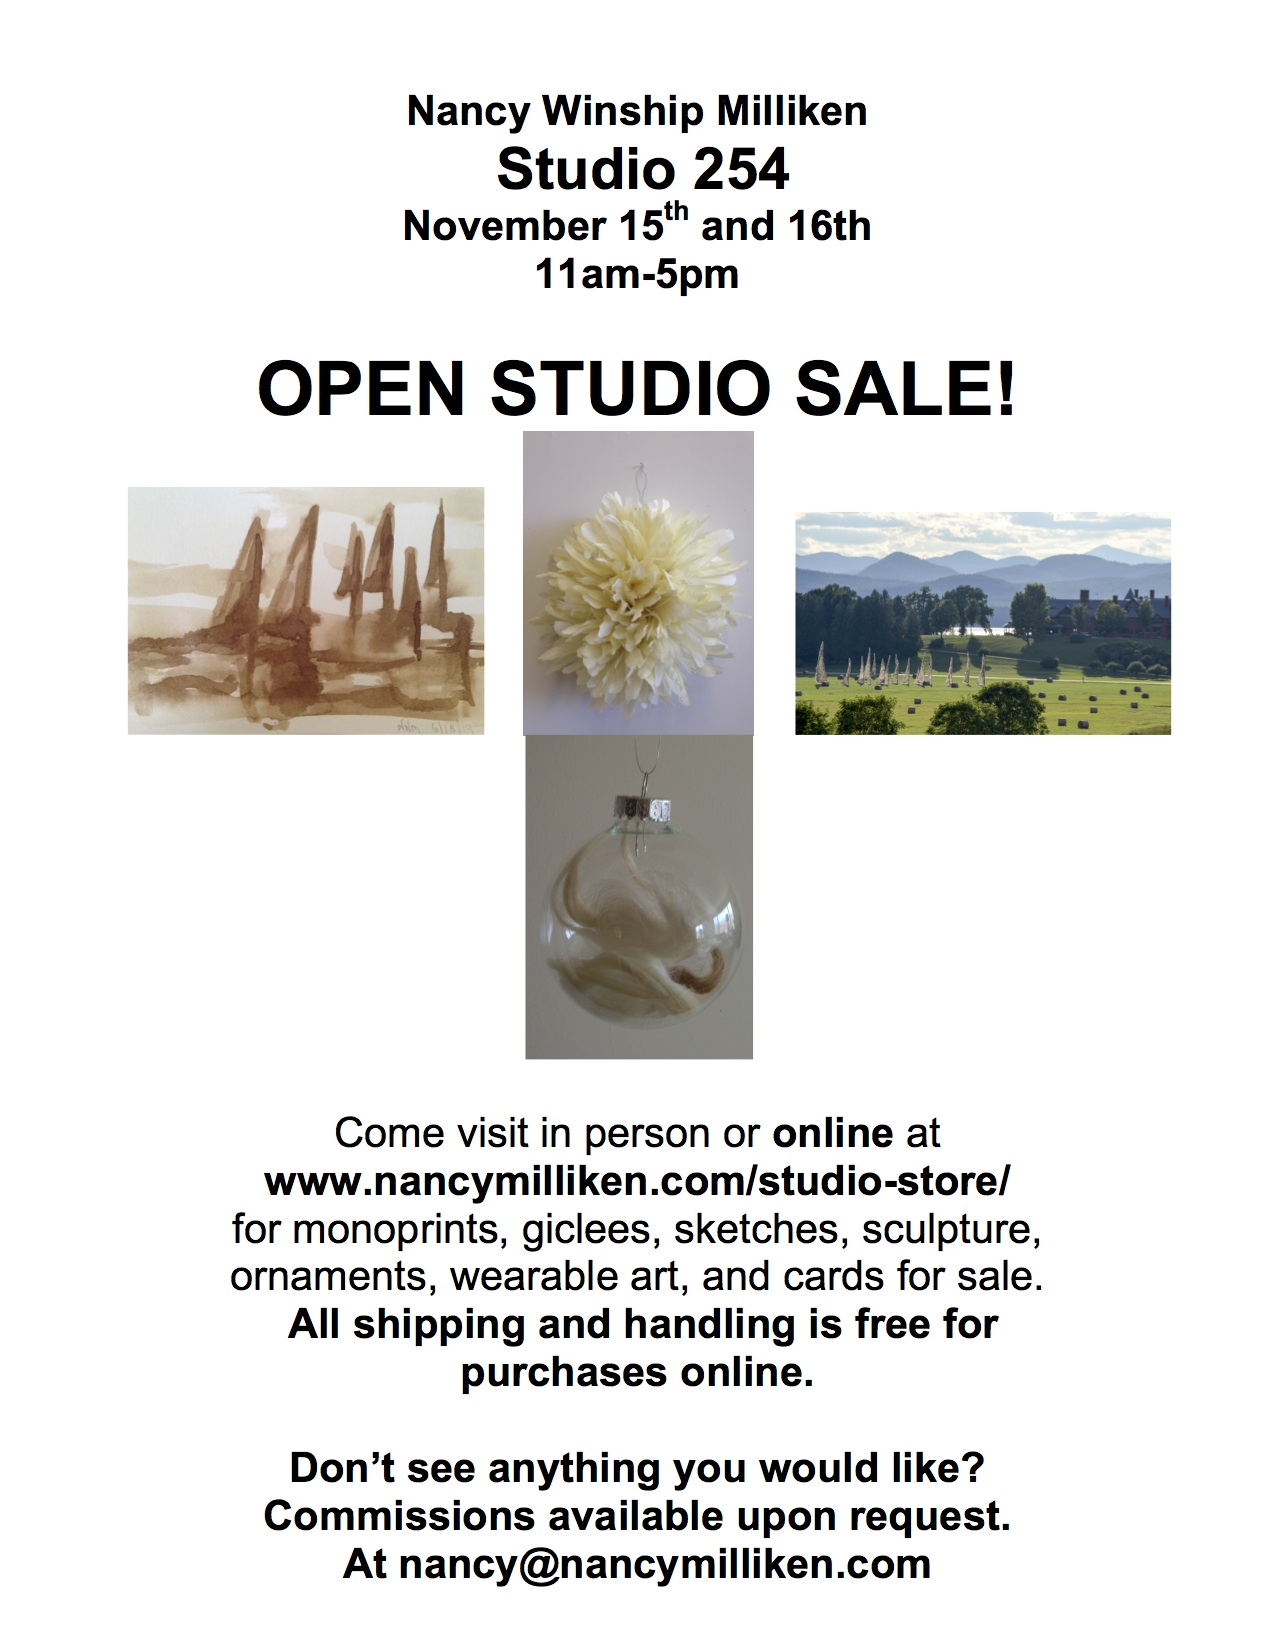 Open Studio Sale 2014 copy.jpg